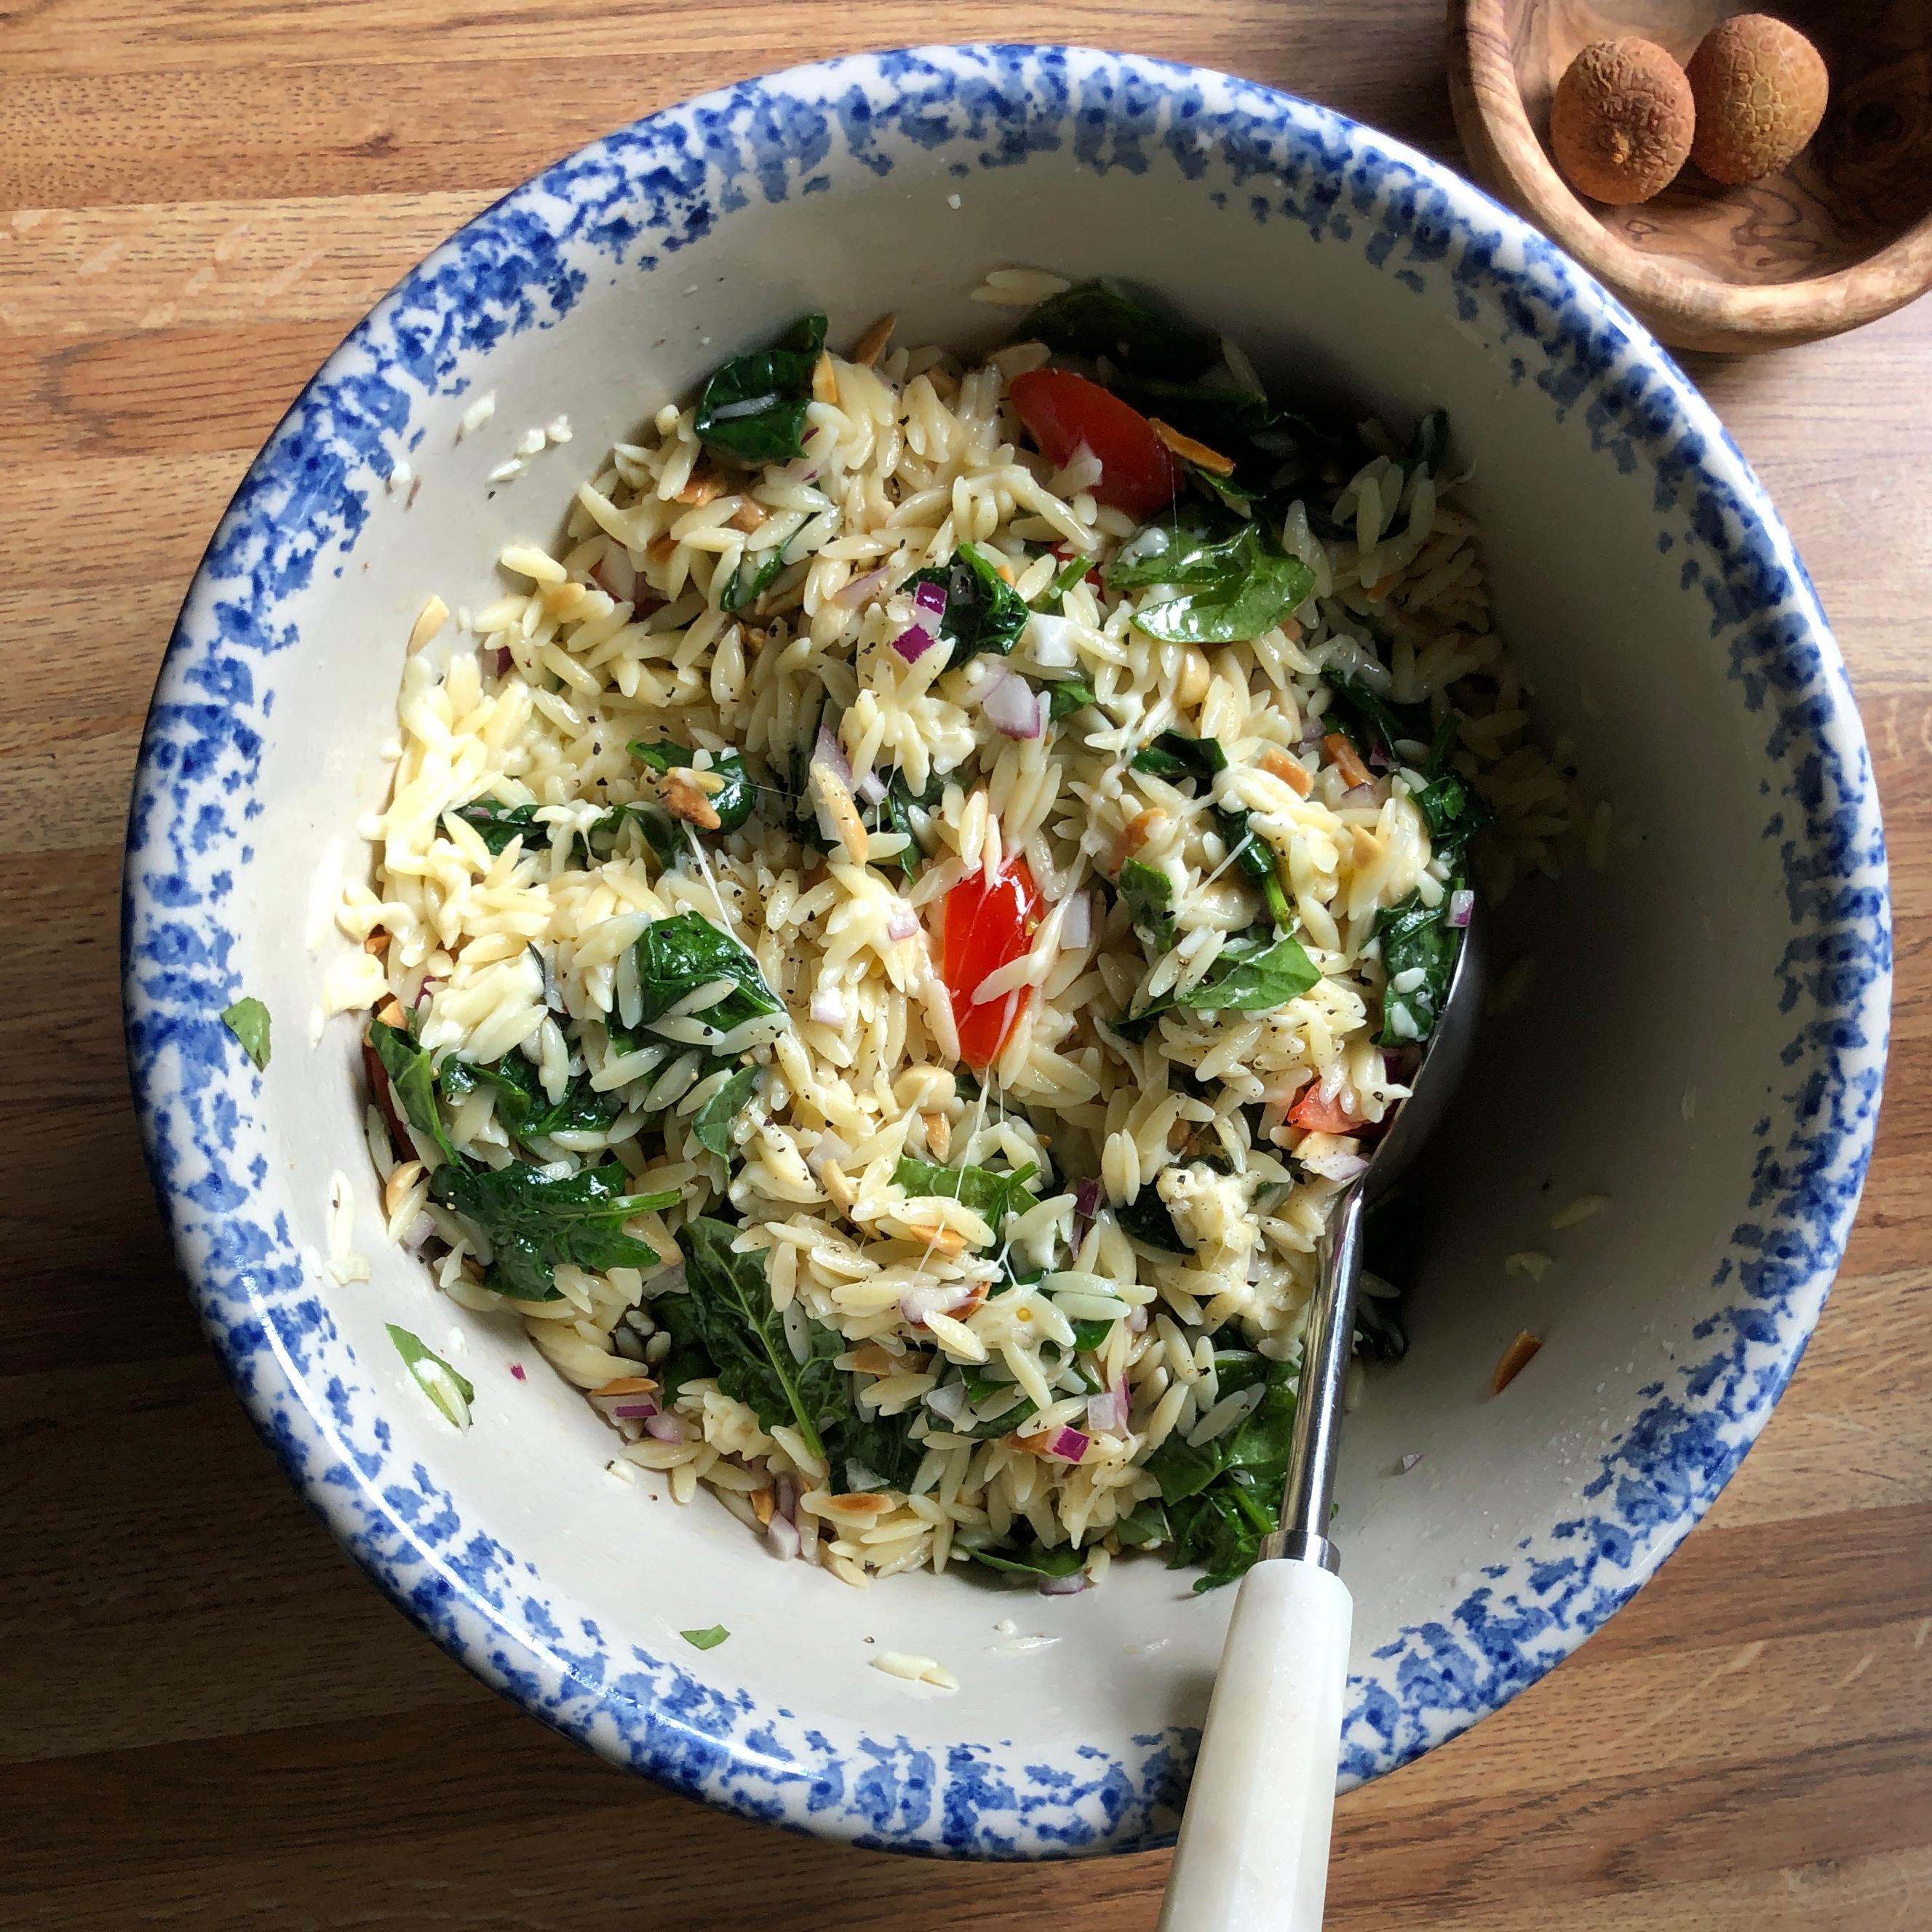 Spinach and Orzo Salad Lisa Crawford